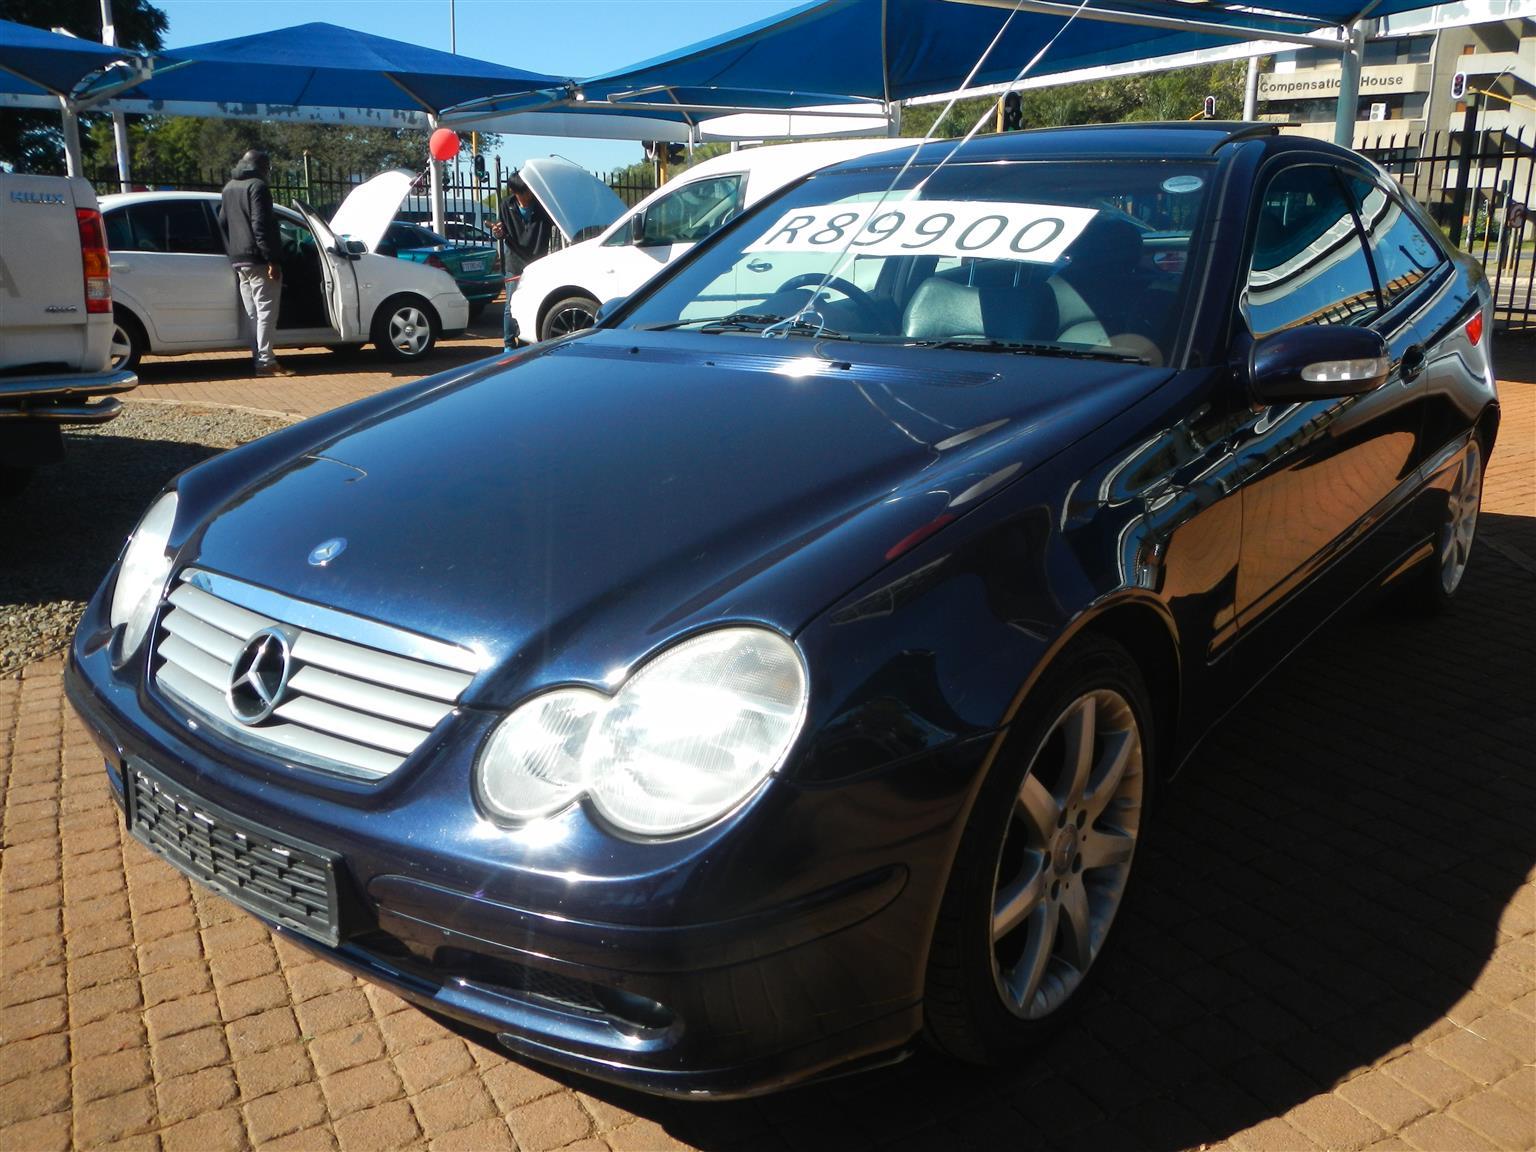 2002 Mercedes Benz C Class C230 Kompressor Sports Coupé Evolution